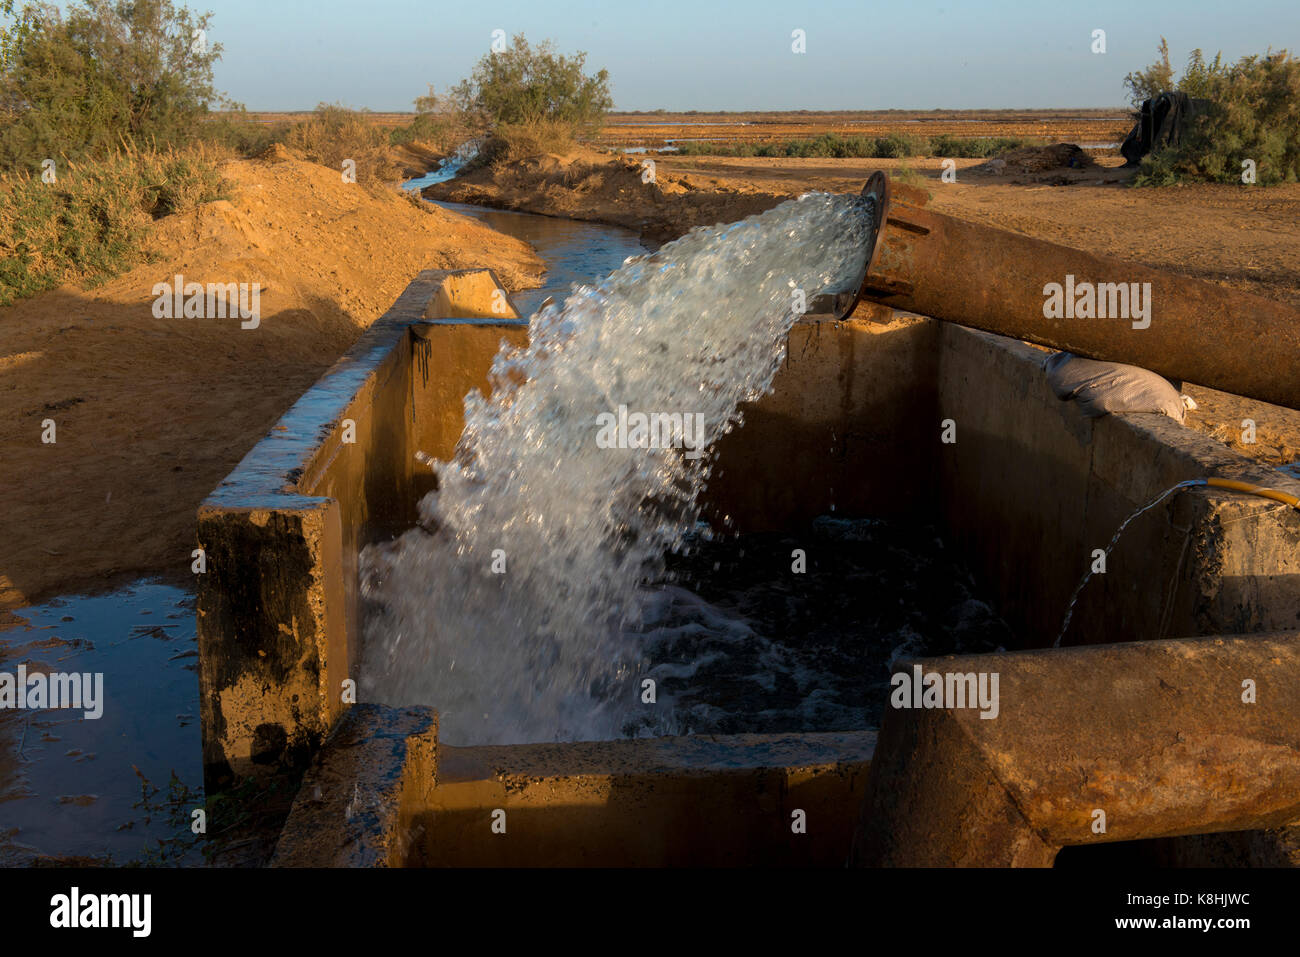 Rice field irrigation. senegal. - Stock Image